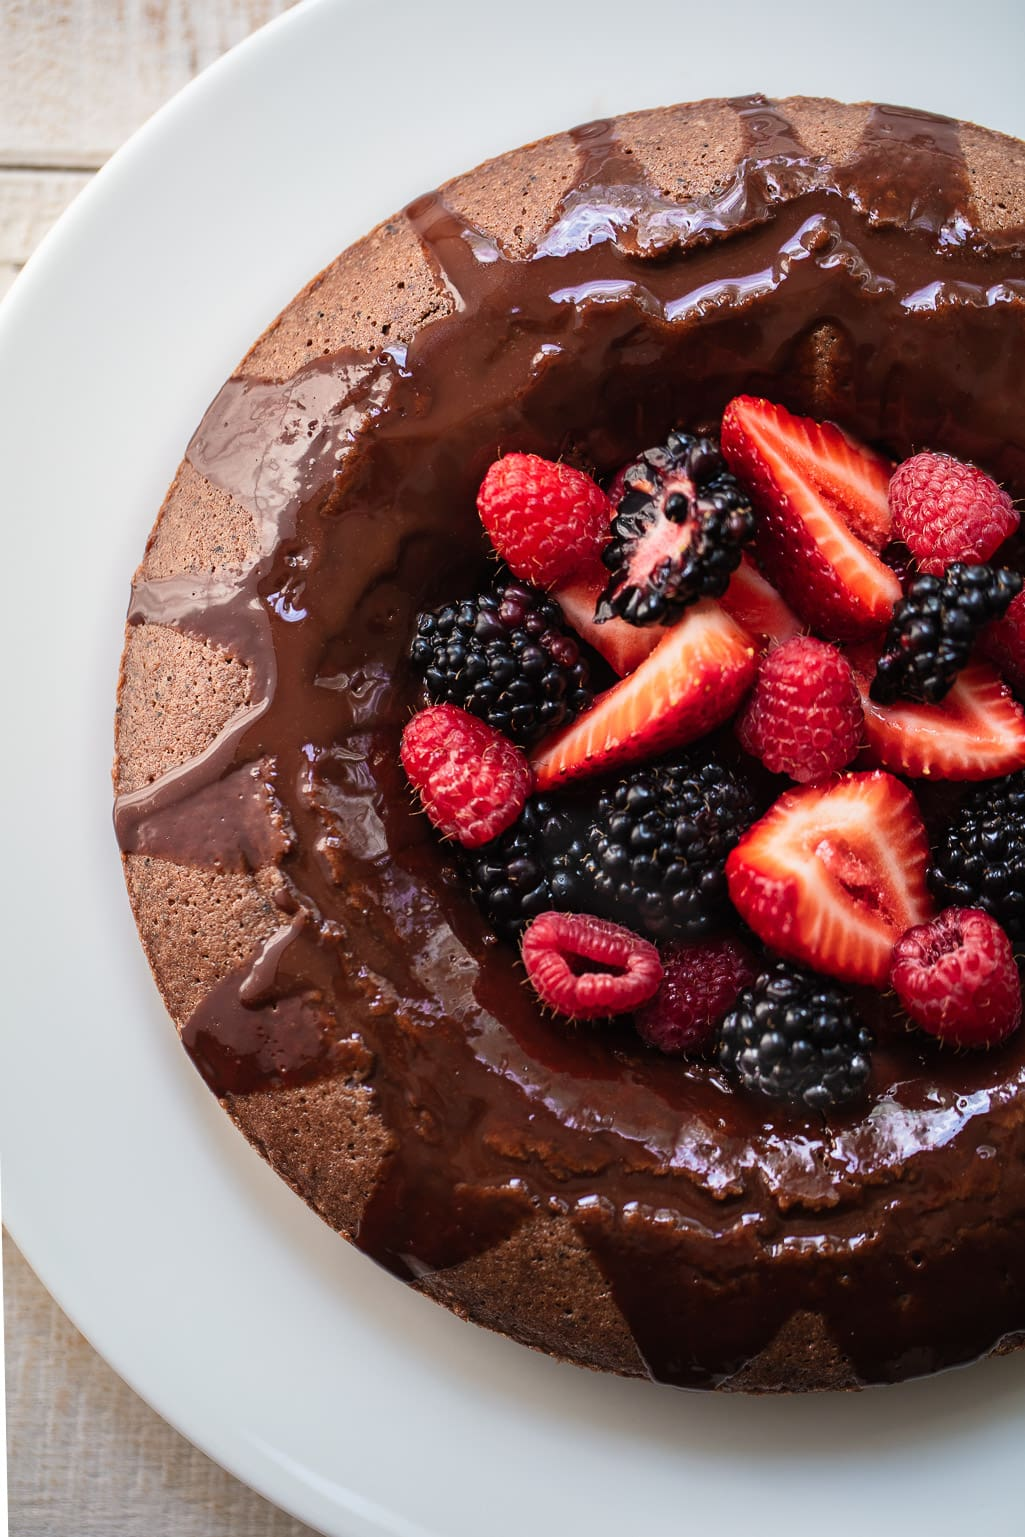 Glazed Italian Chocolate Ring Cake with Berries